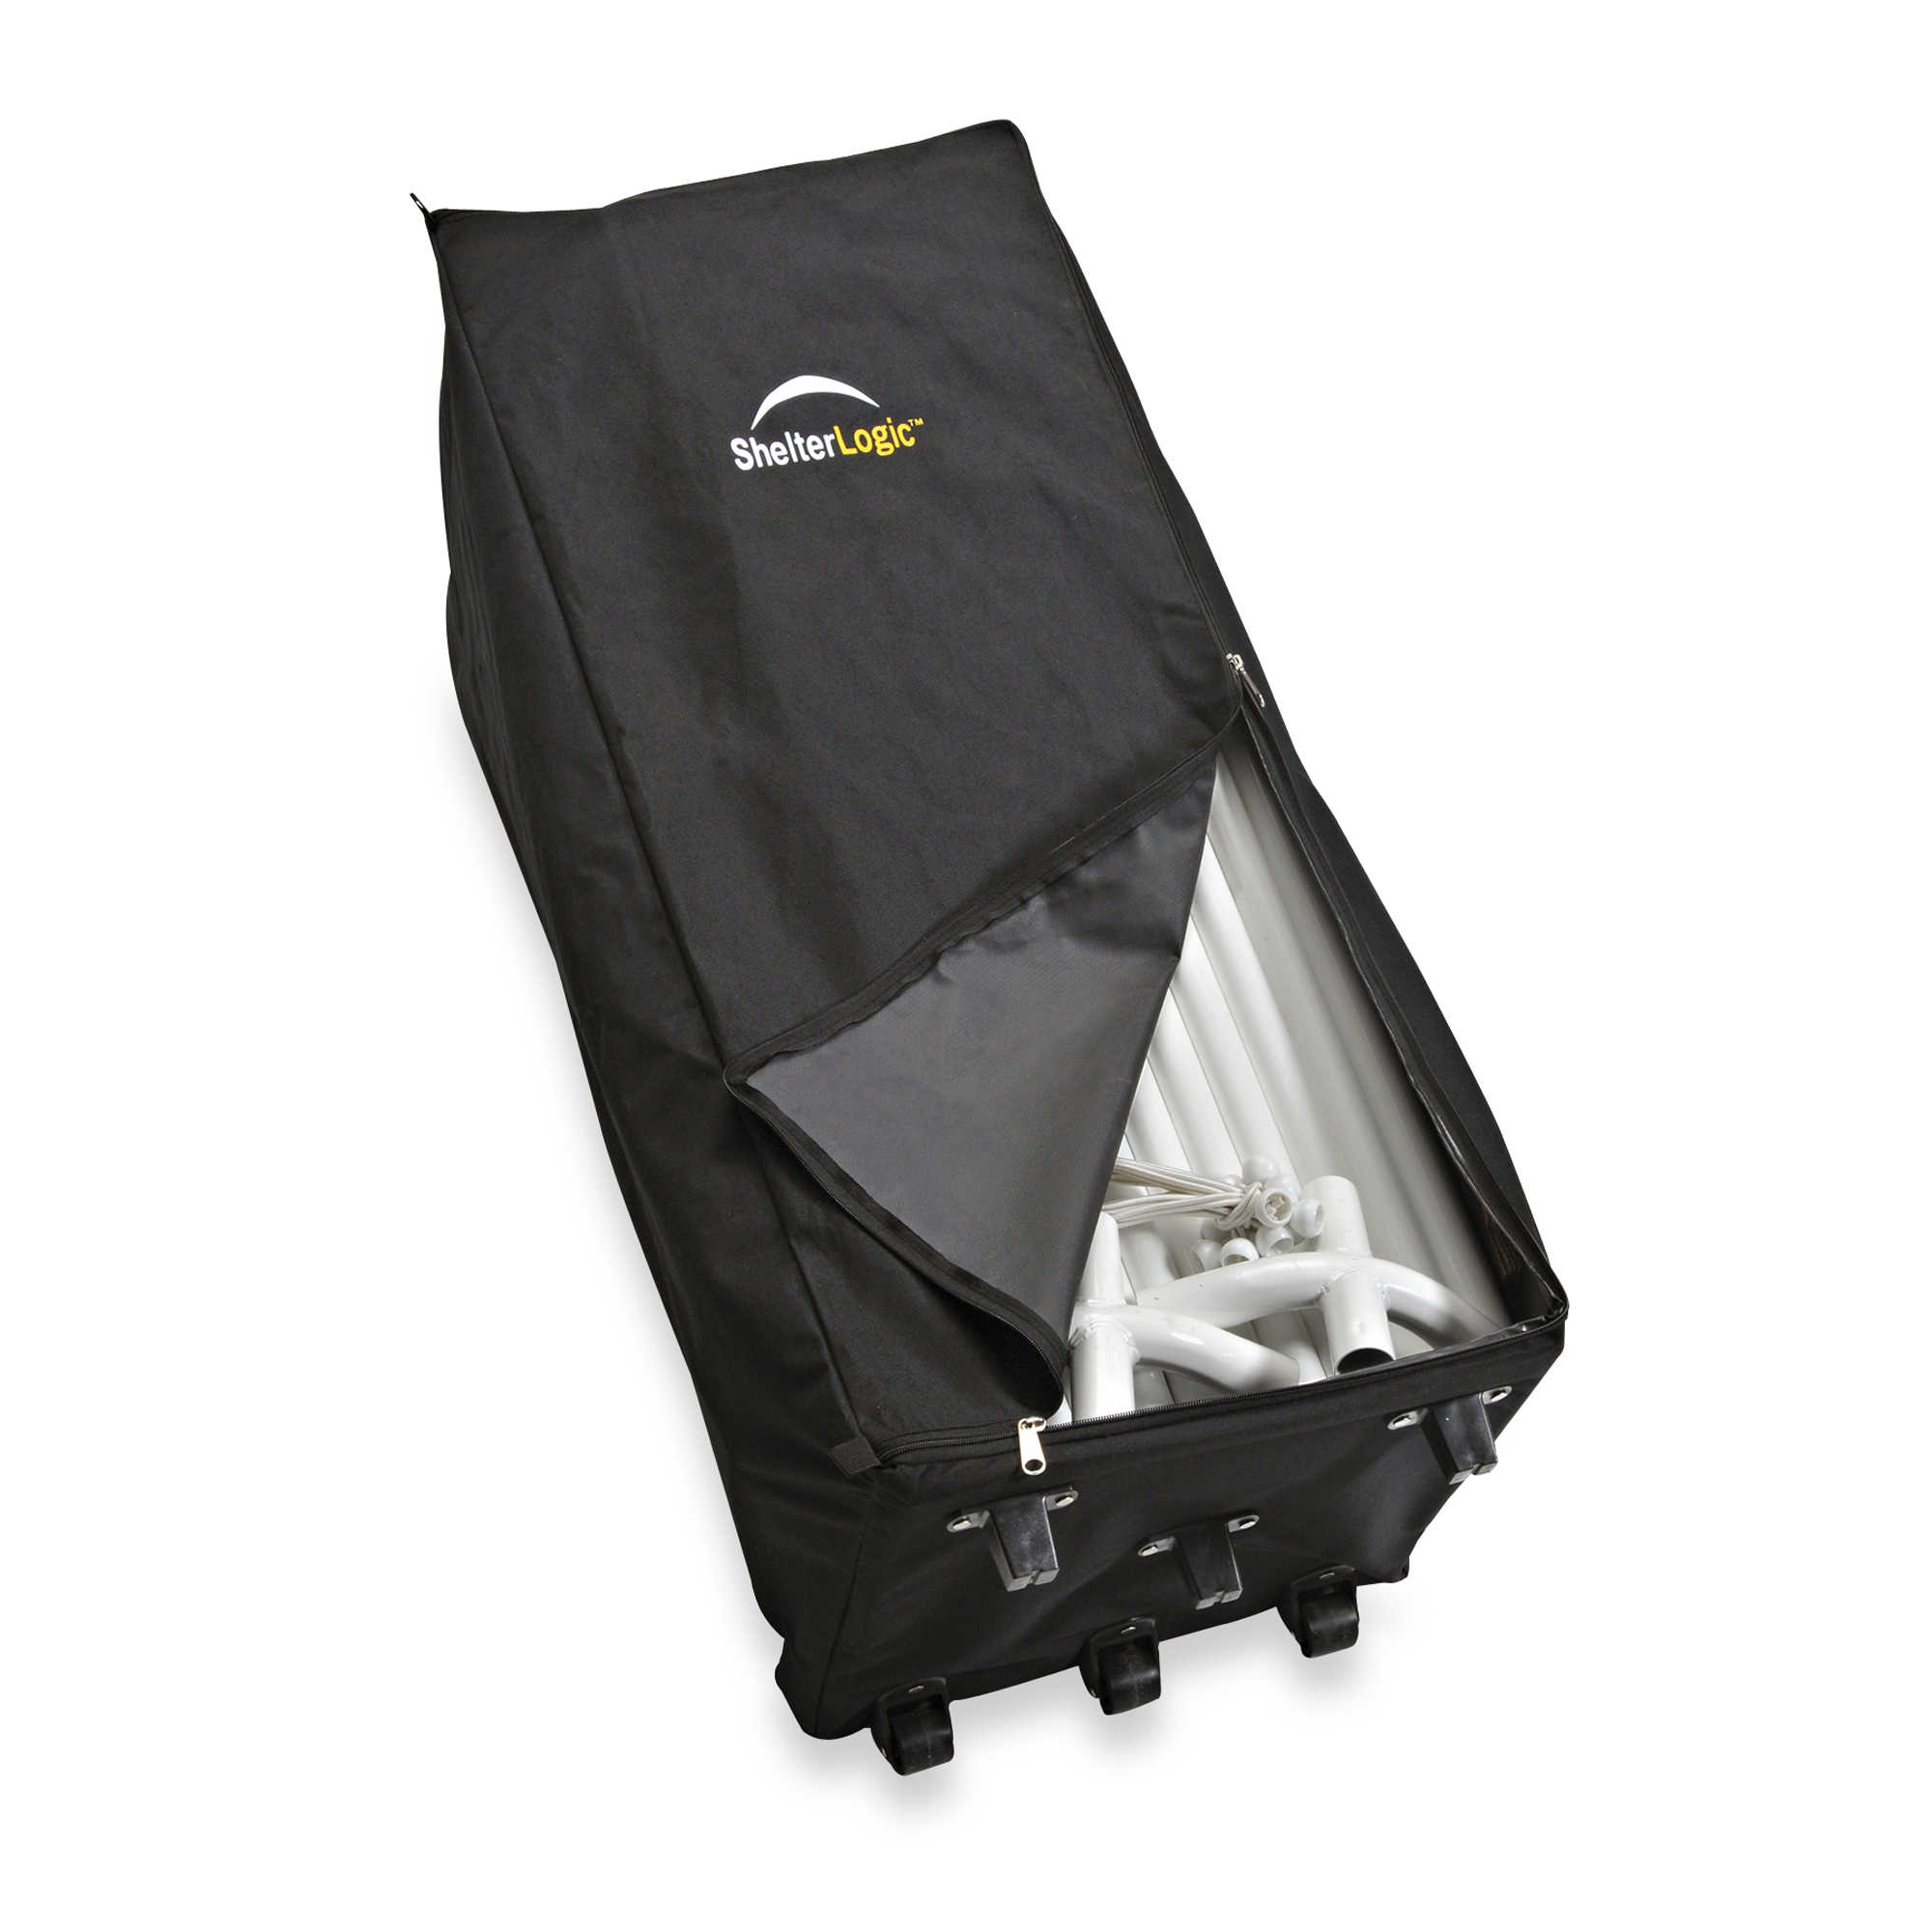 ShelterLogic 15577 STORE-IT Canopy Rolling Storage Bag тент shelterlogic gardendreams 80240